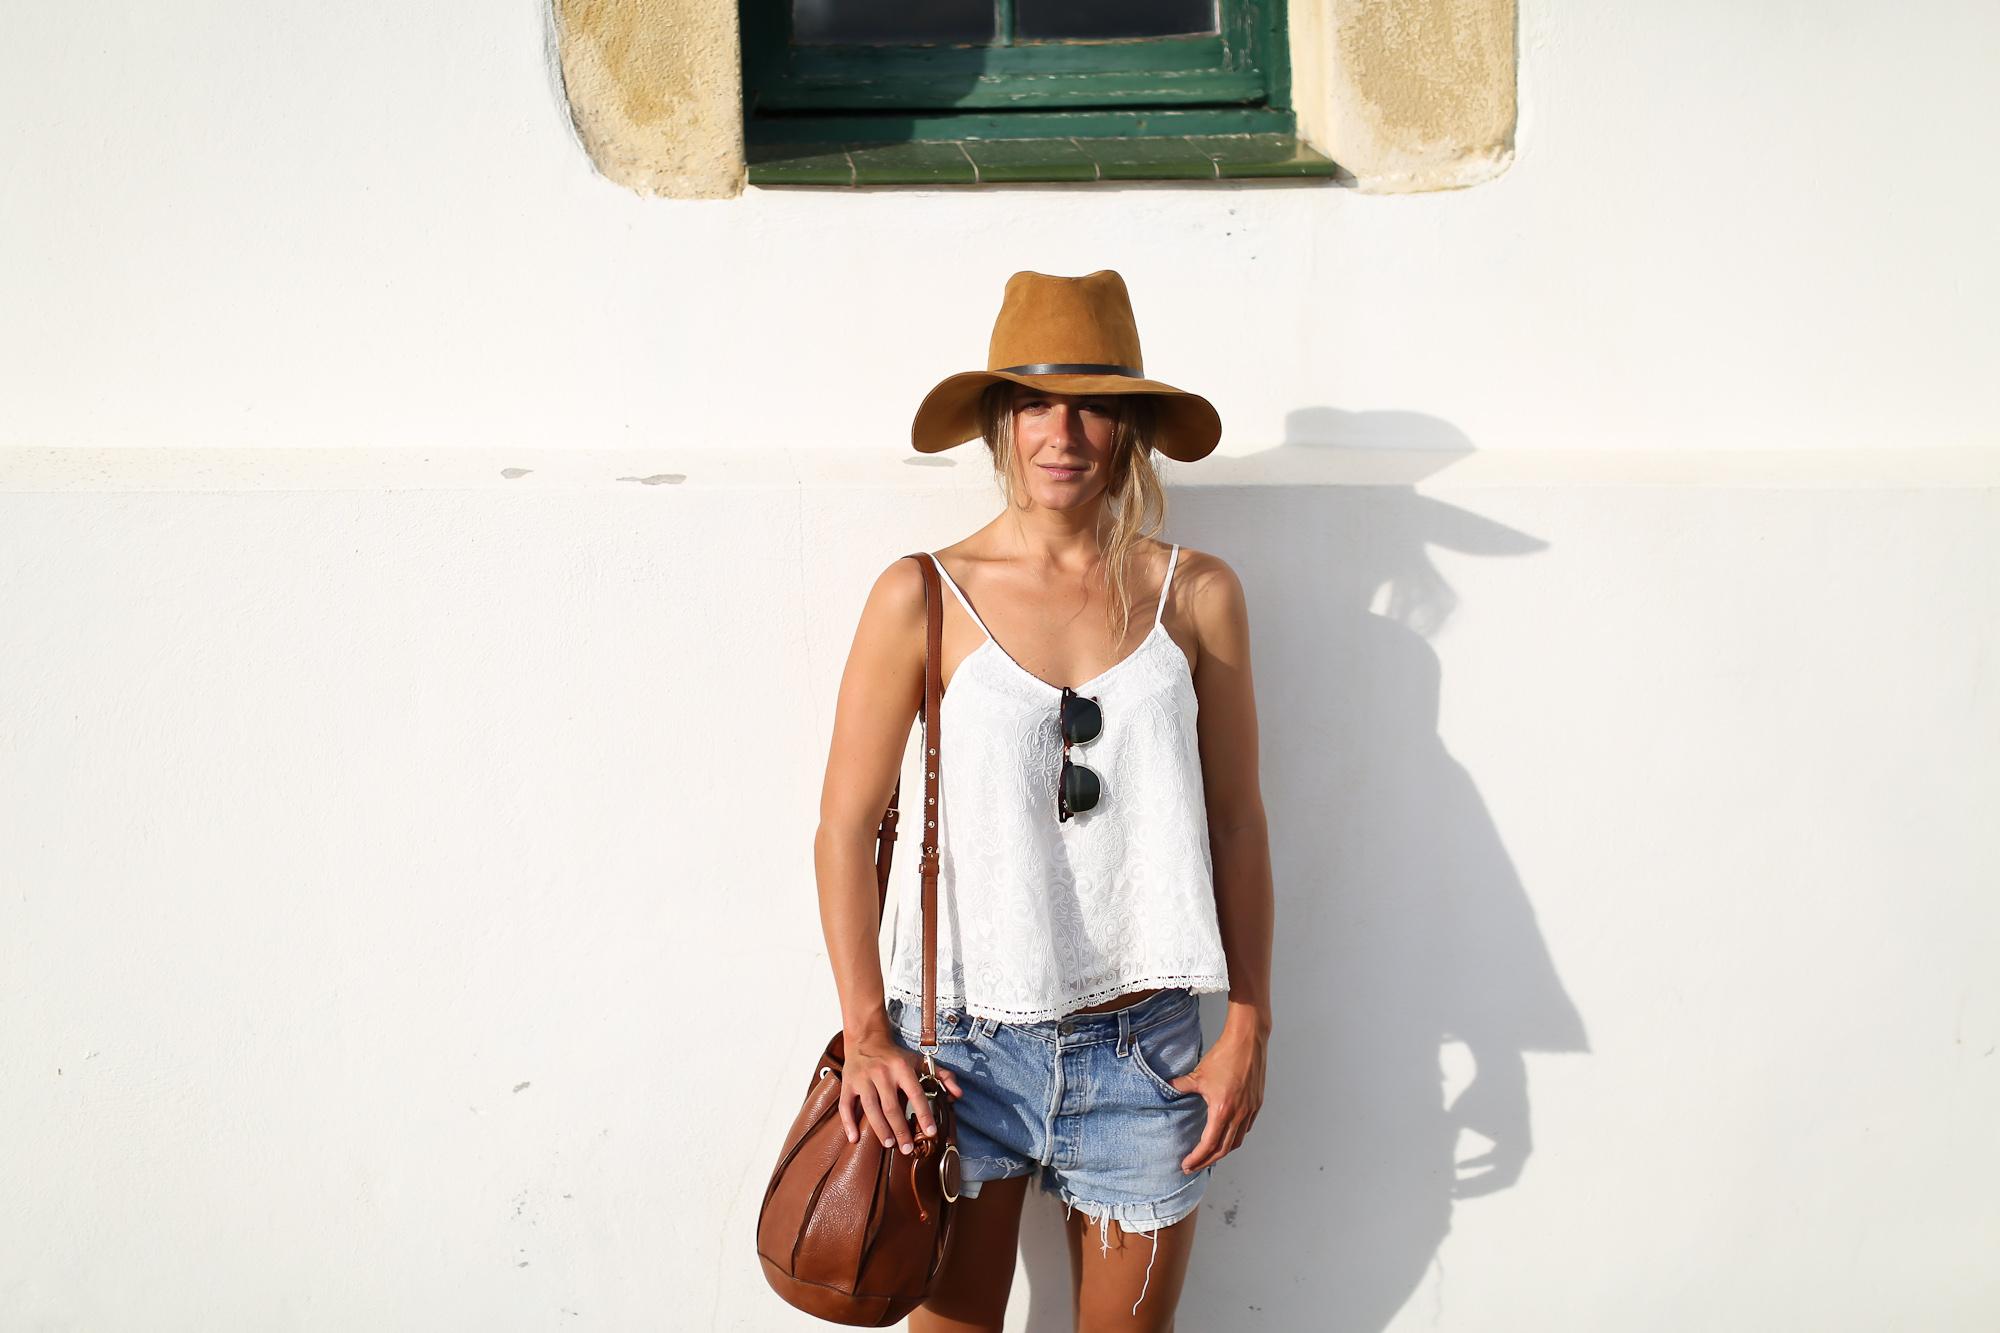 Clochet_streetstyle_levis_501_vintage_shorts_leather_fedora_hat-8